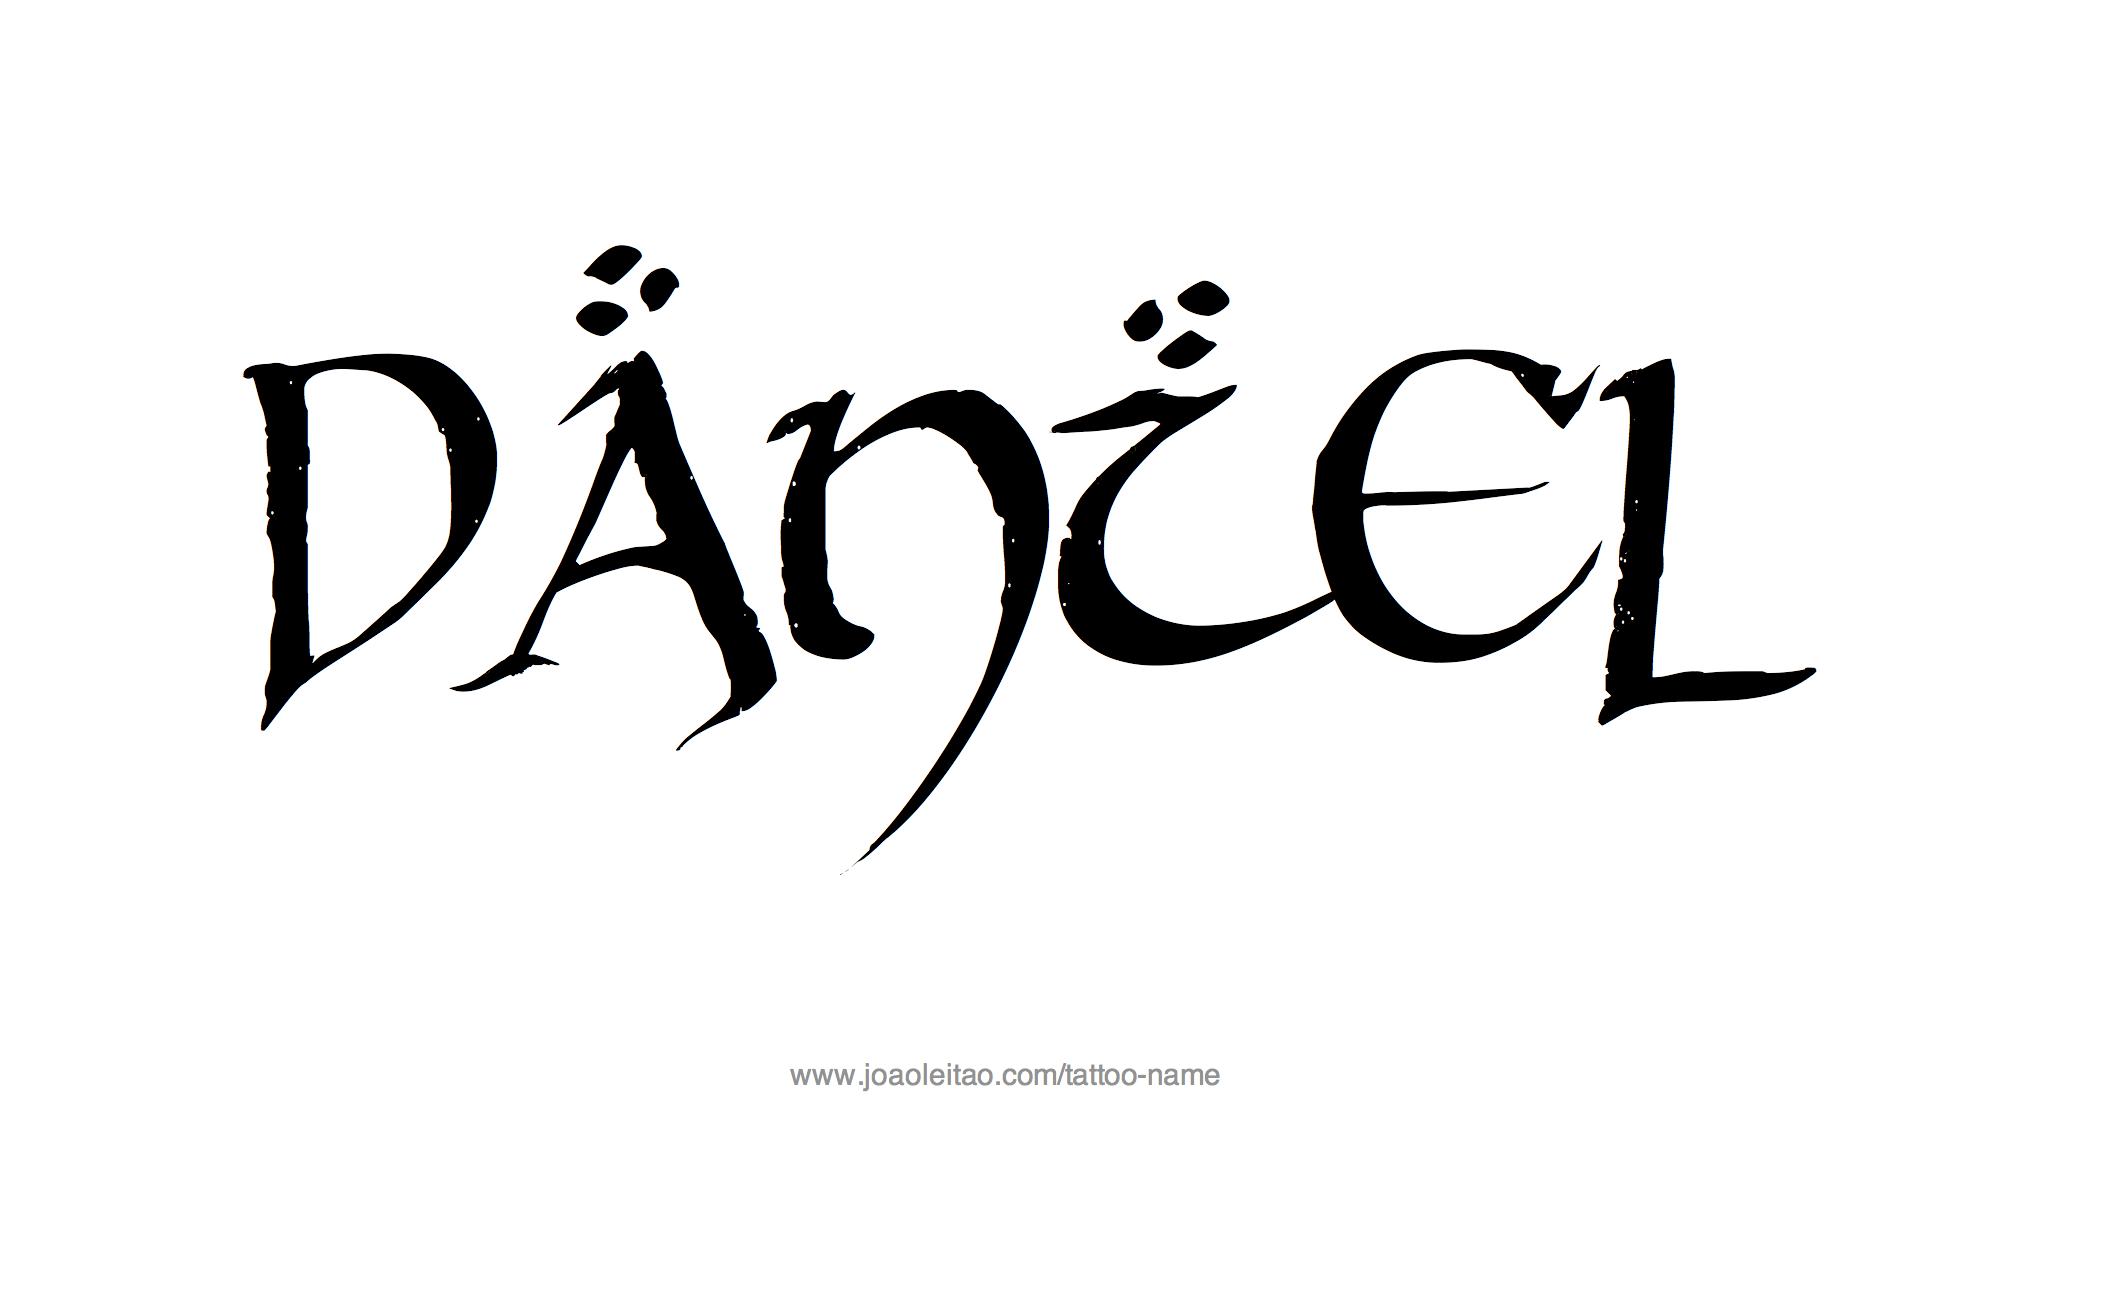 daniel name design pictures to pin on pinterest thepinsta. Black Bedroom Furniture Sets. Home Design Ideas